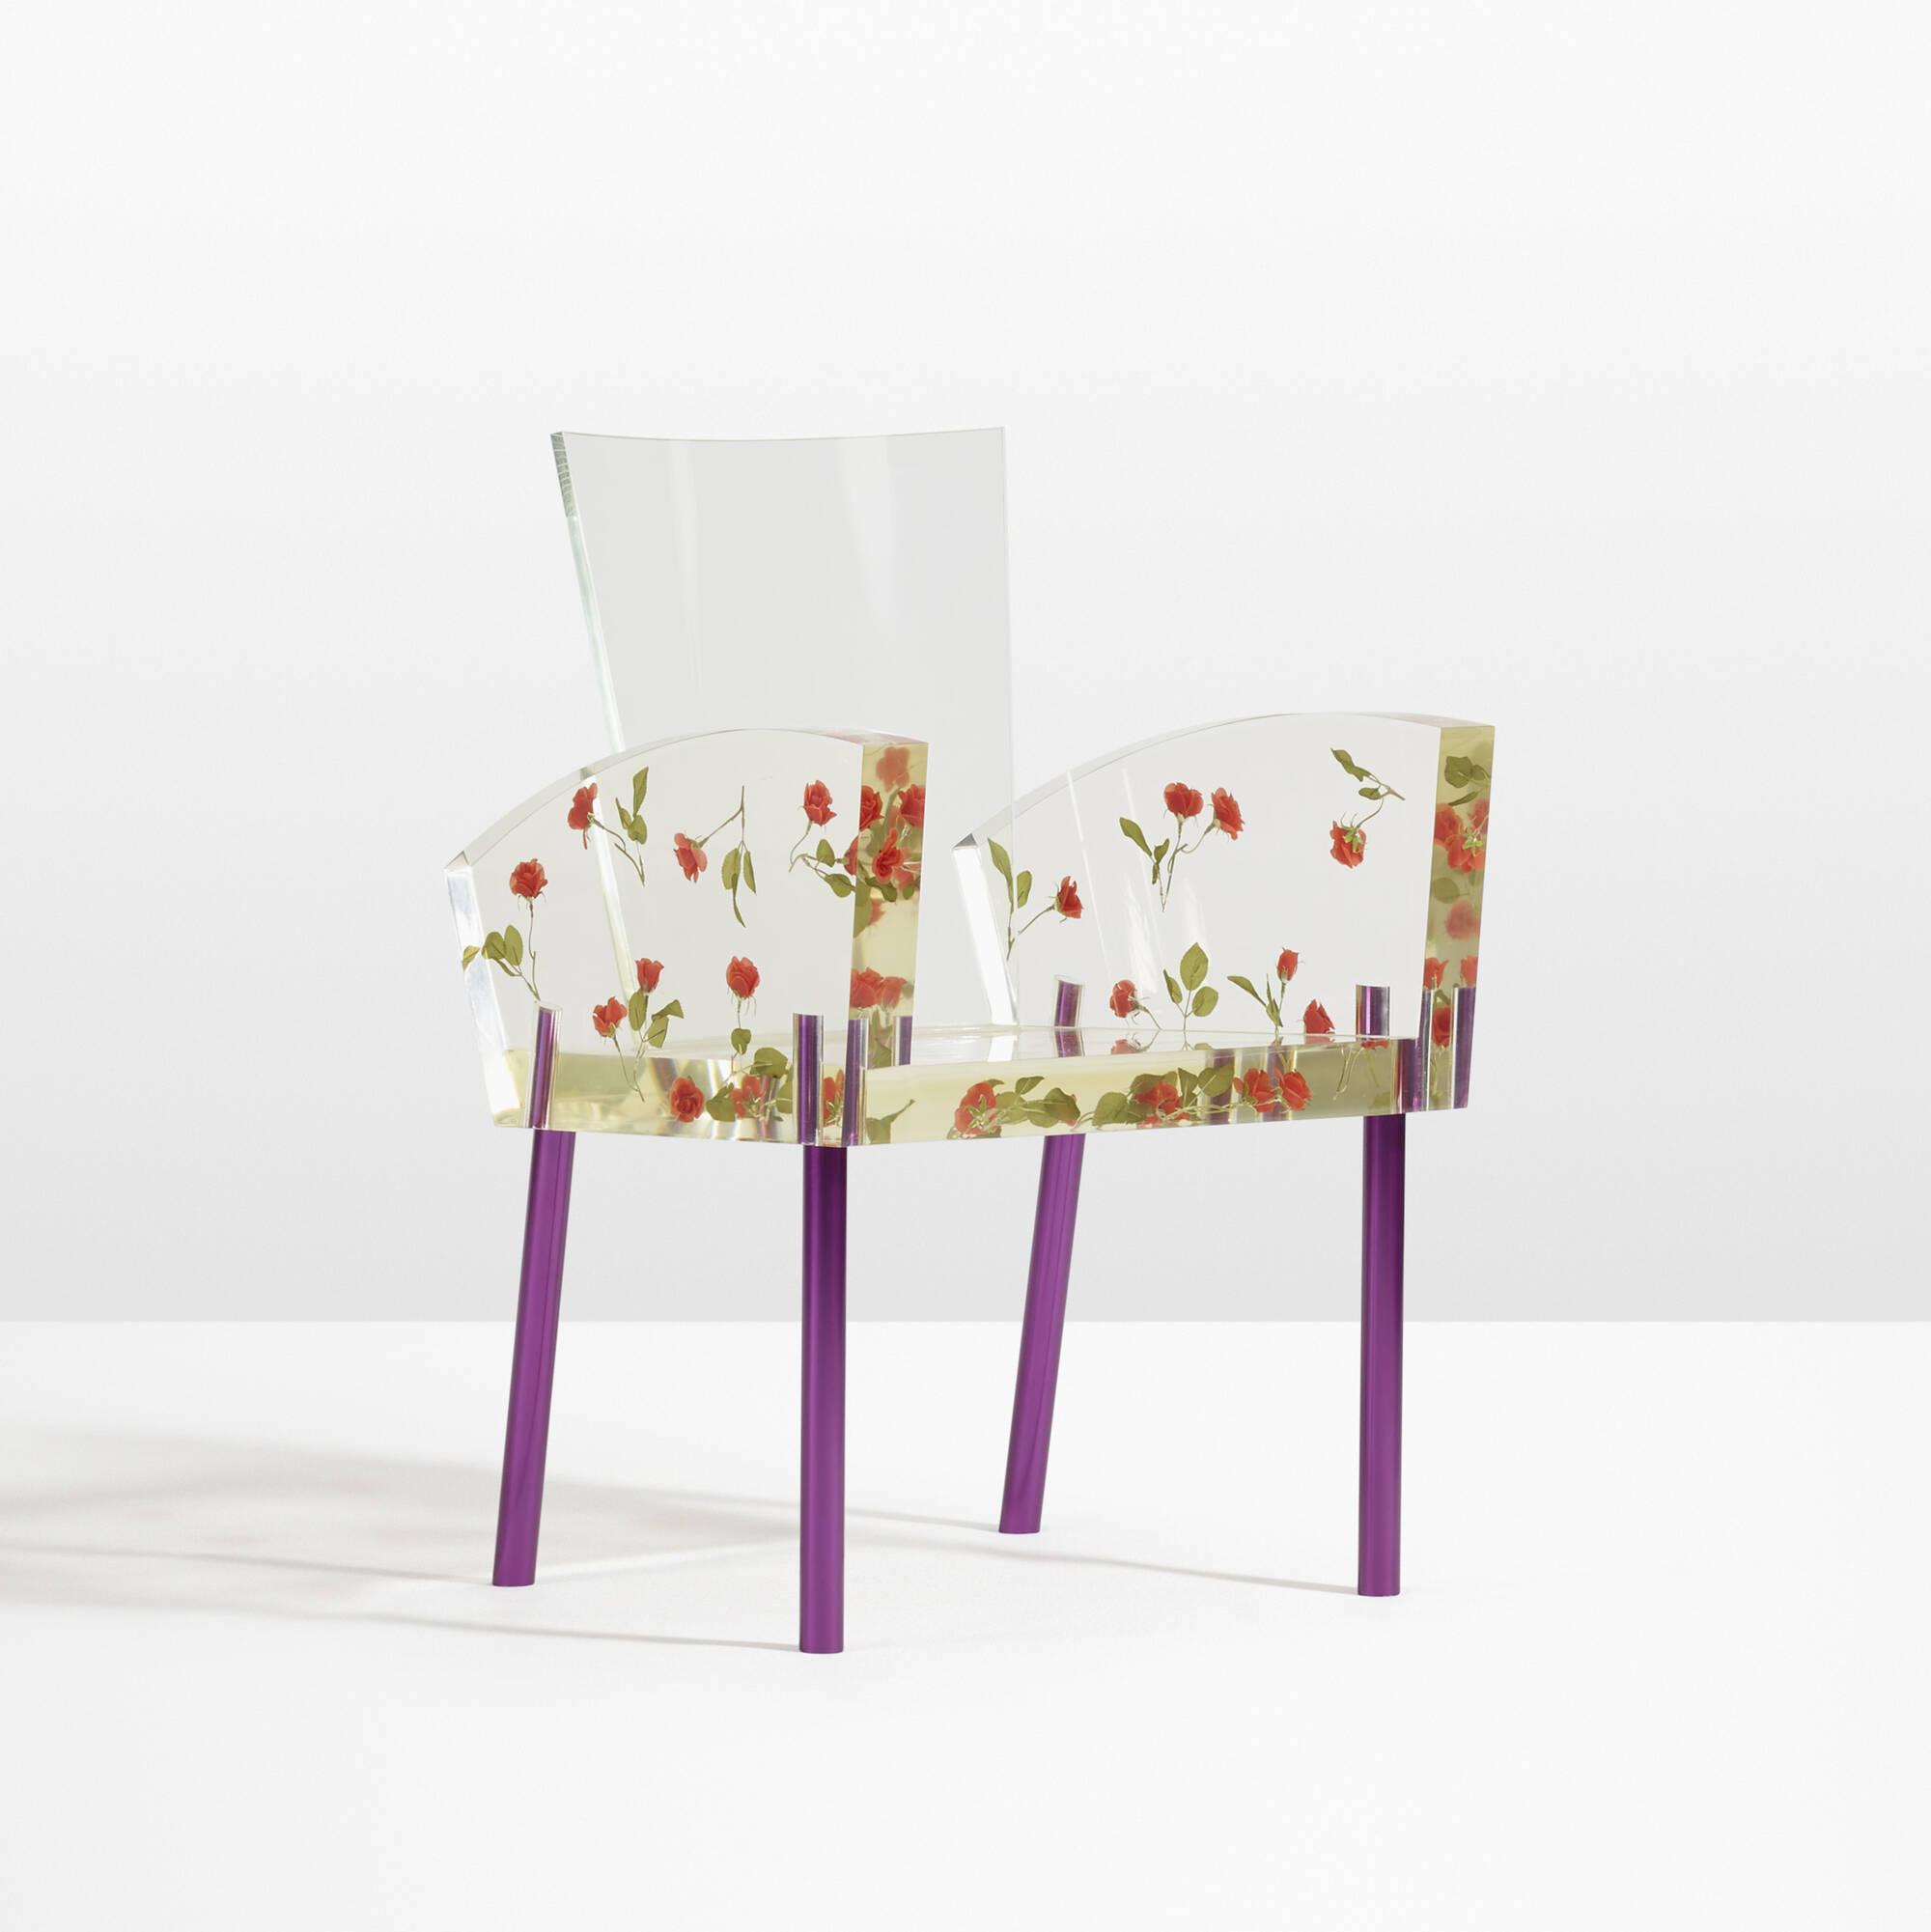 7: Shiro Kuramata / Miss Blanche chair (1 of 6)